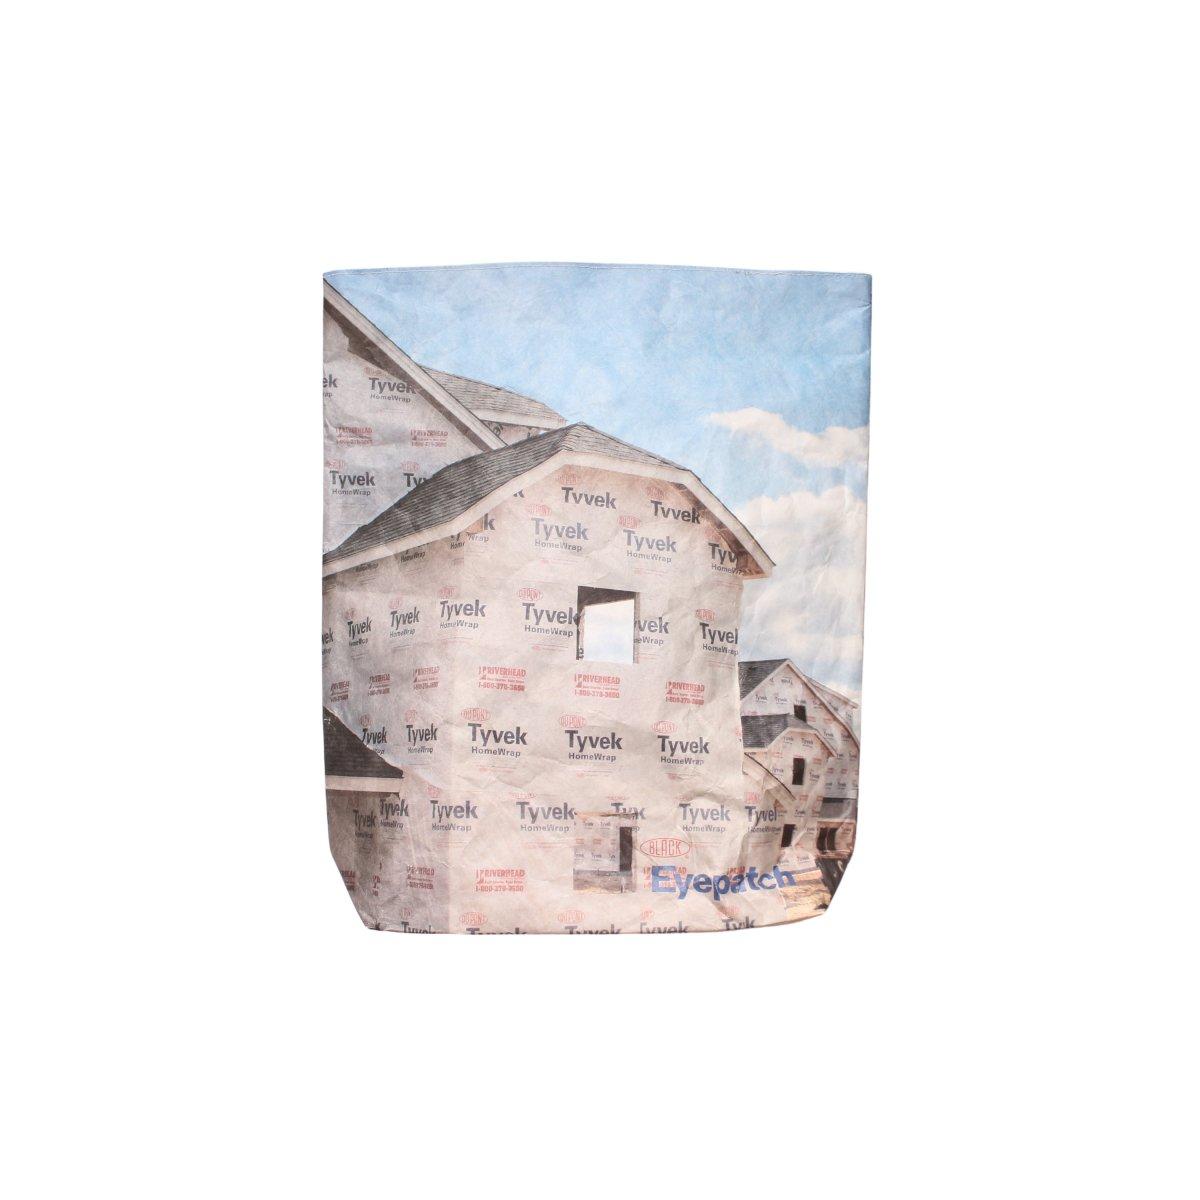 HOUSEWRAP TYVEK CARRY BAG